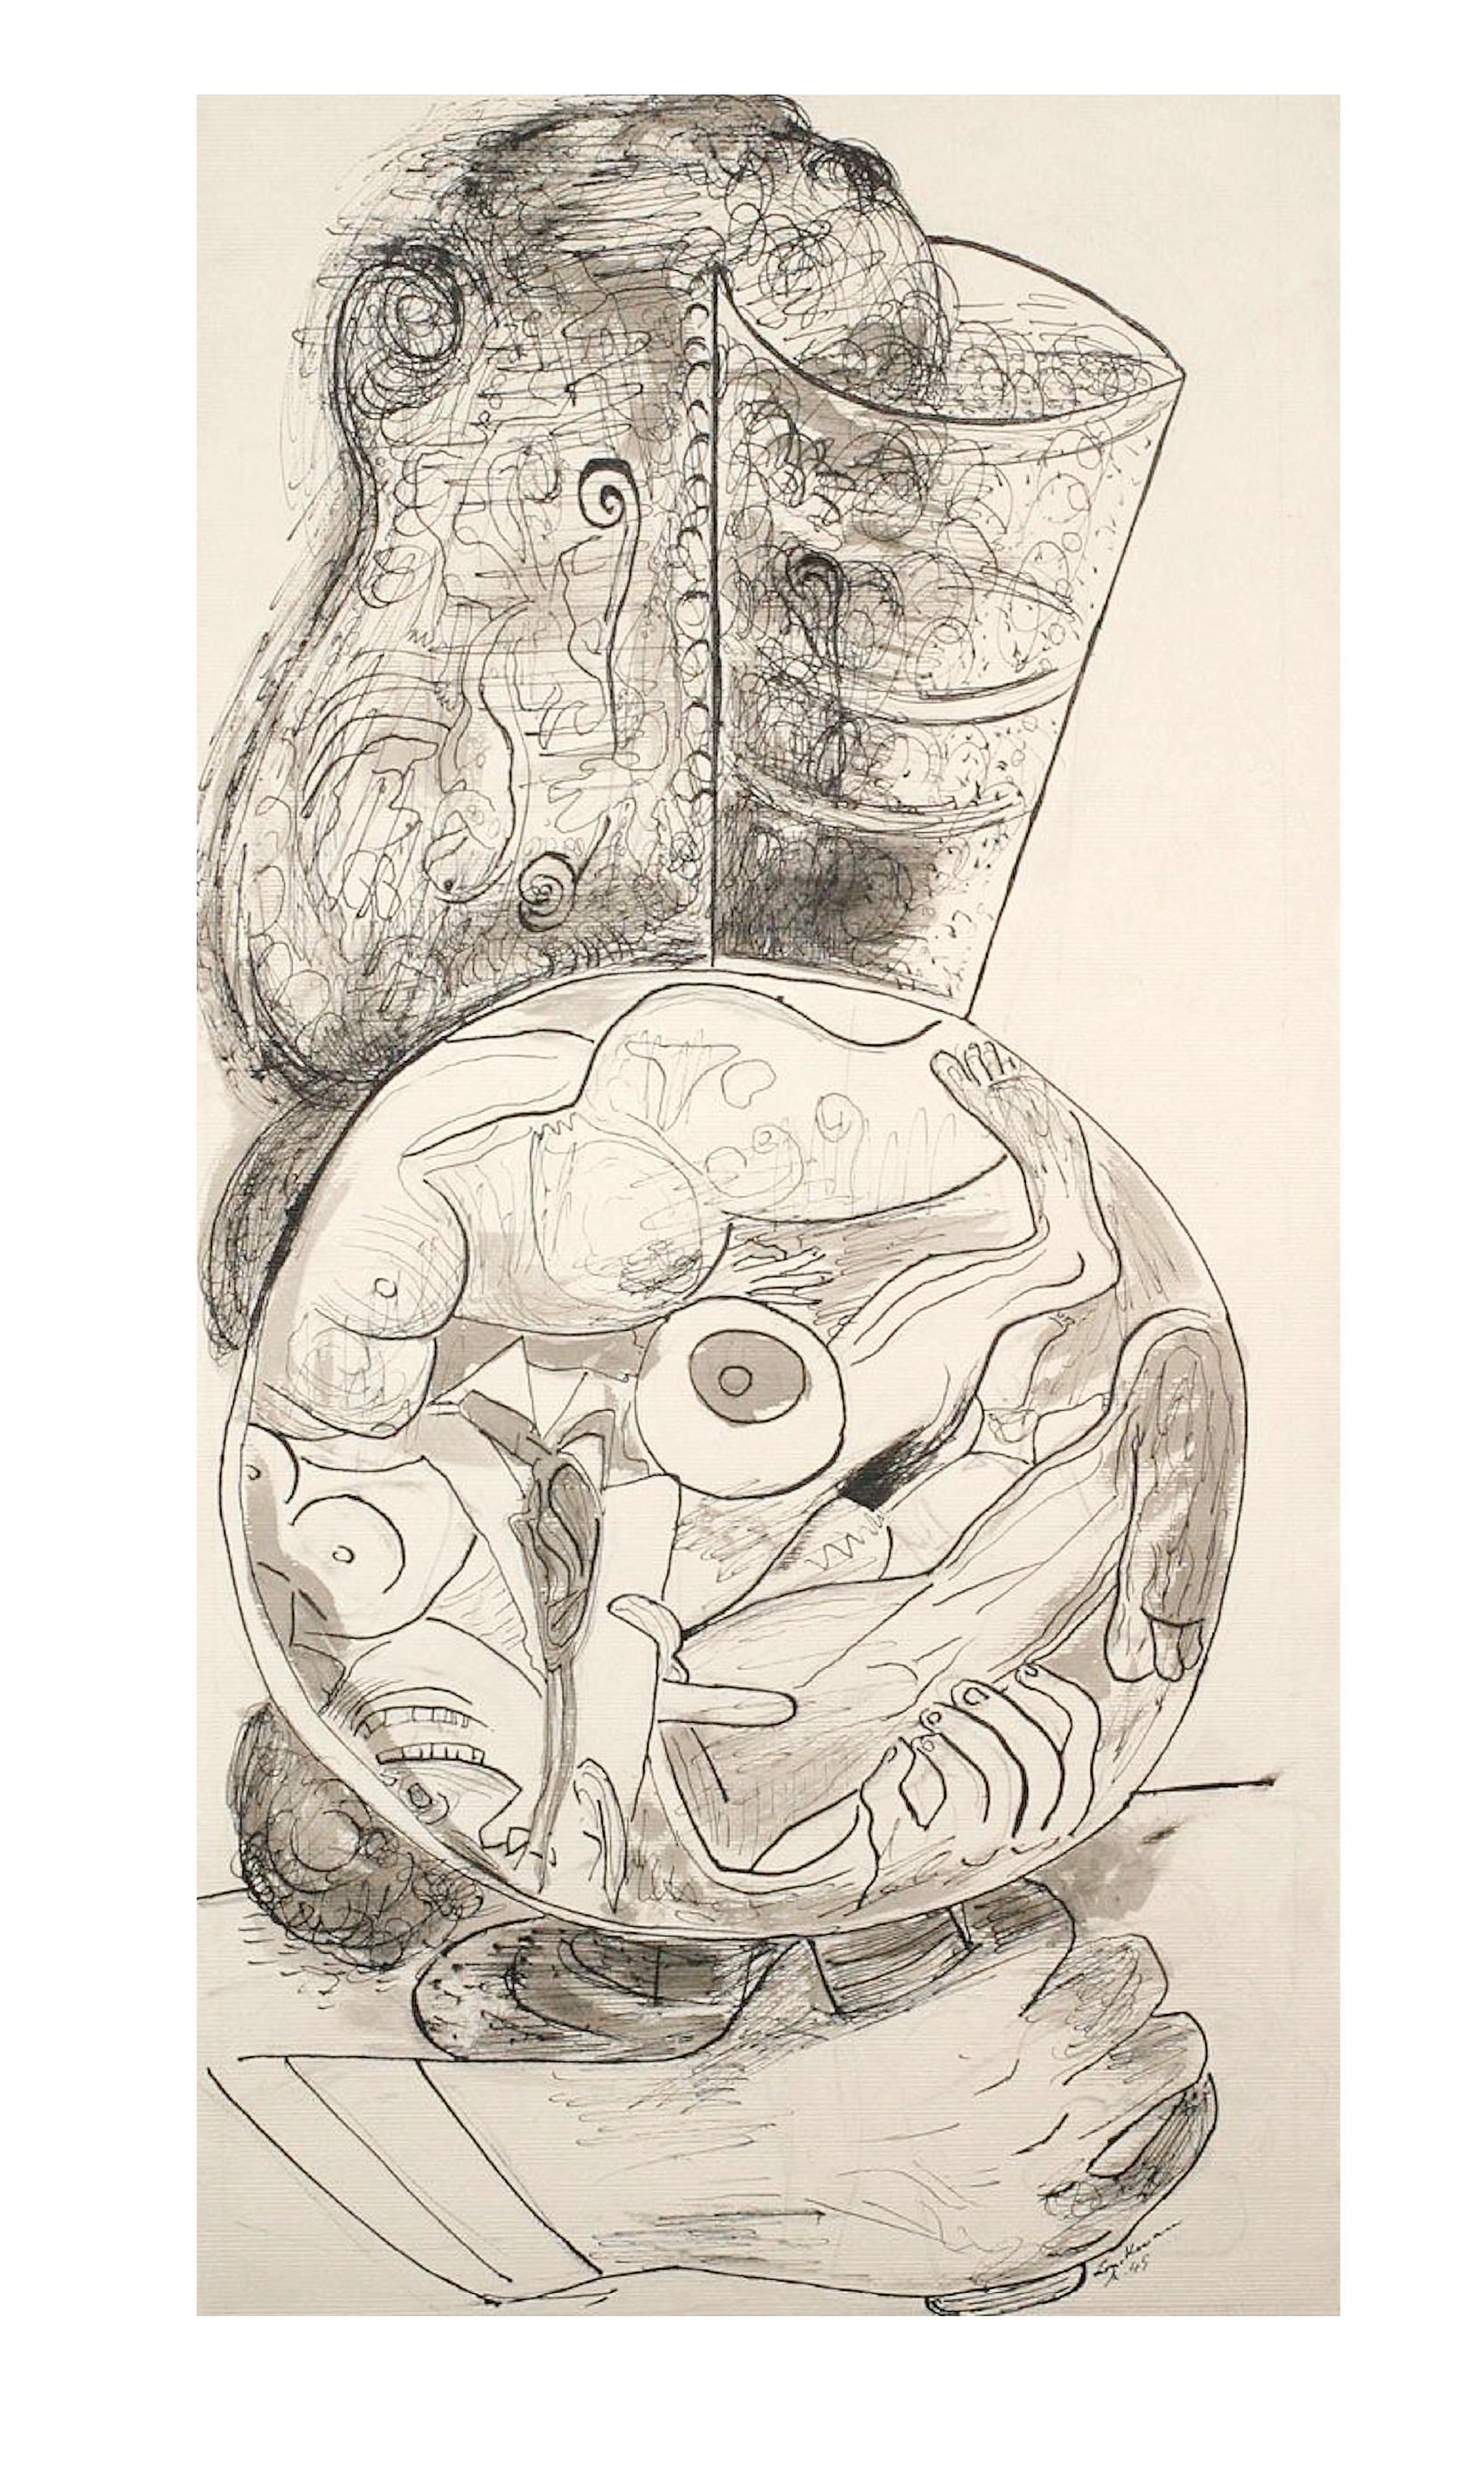 Max Beckmann, Mirror (Champagne Fantasy), 1945